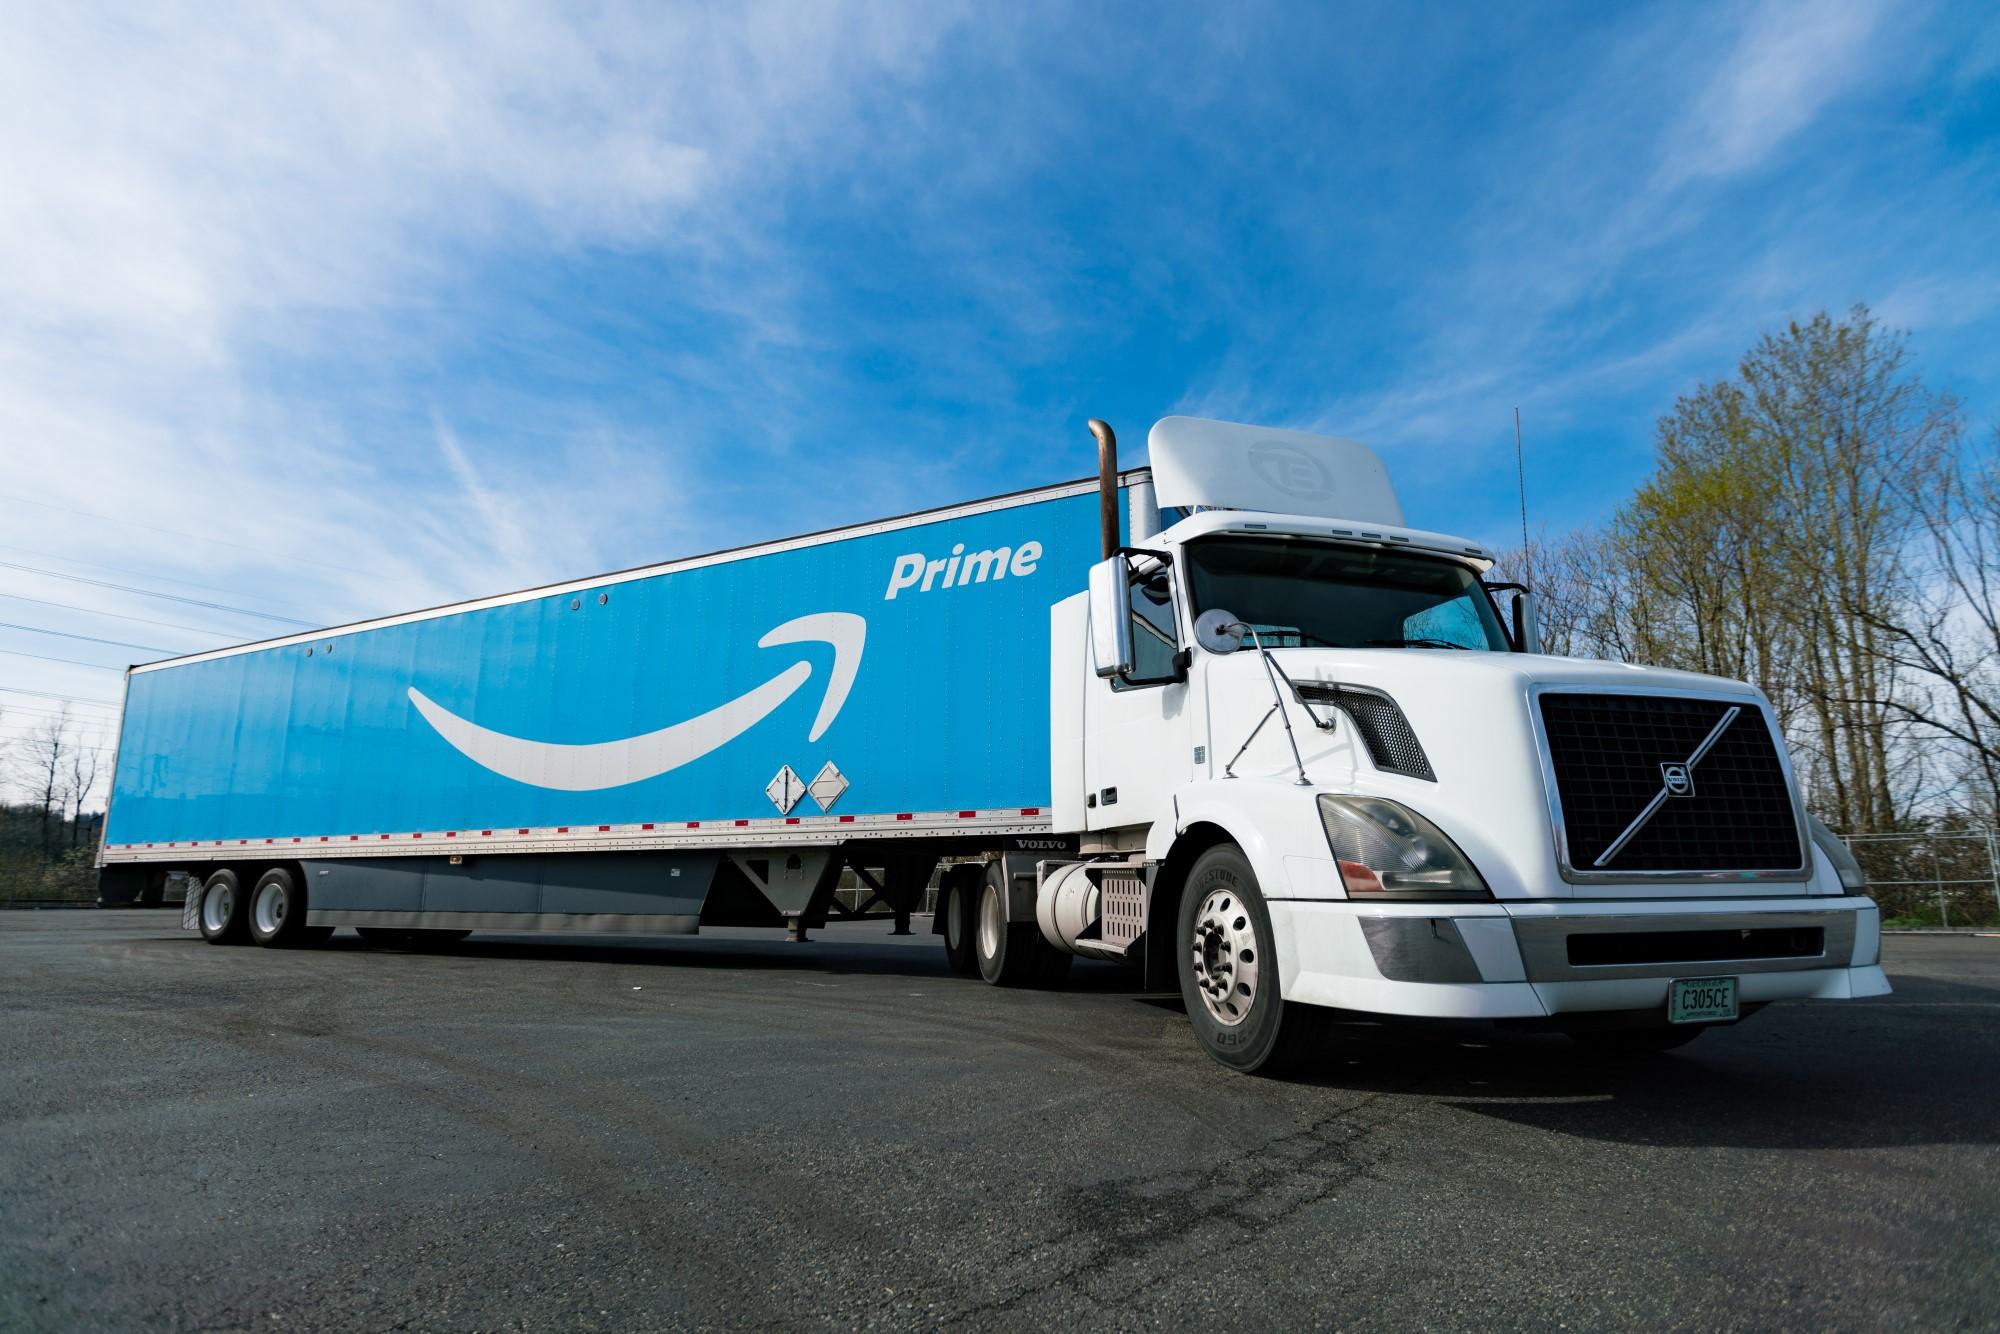 An Amazon truck.